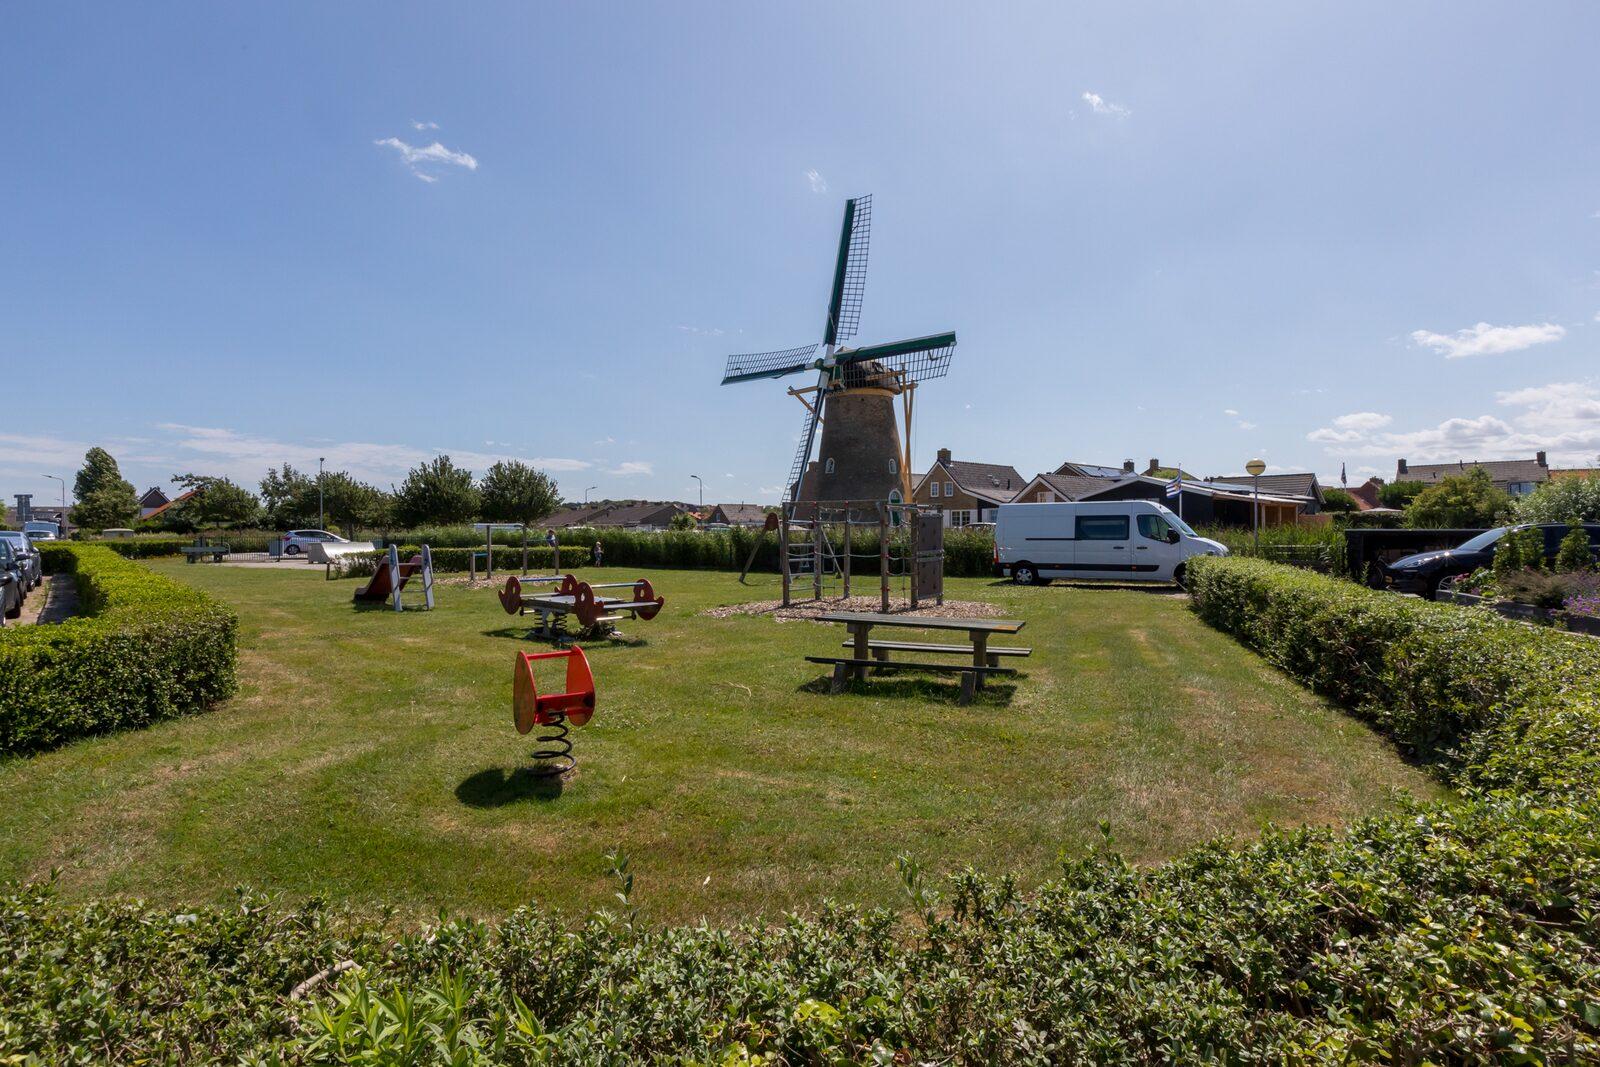 Studio's - Molenweg 27 | Zoutelande